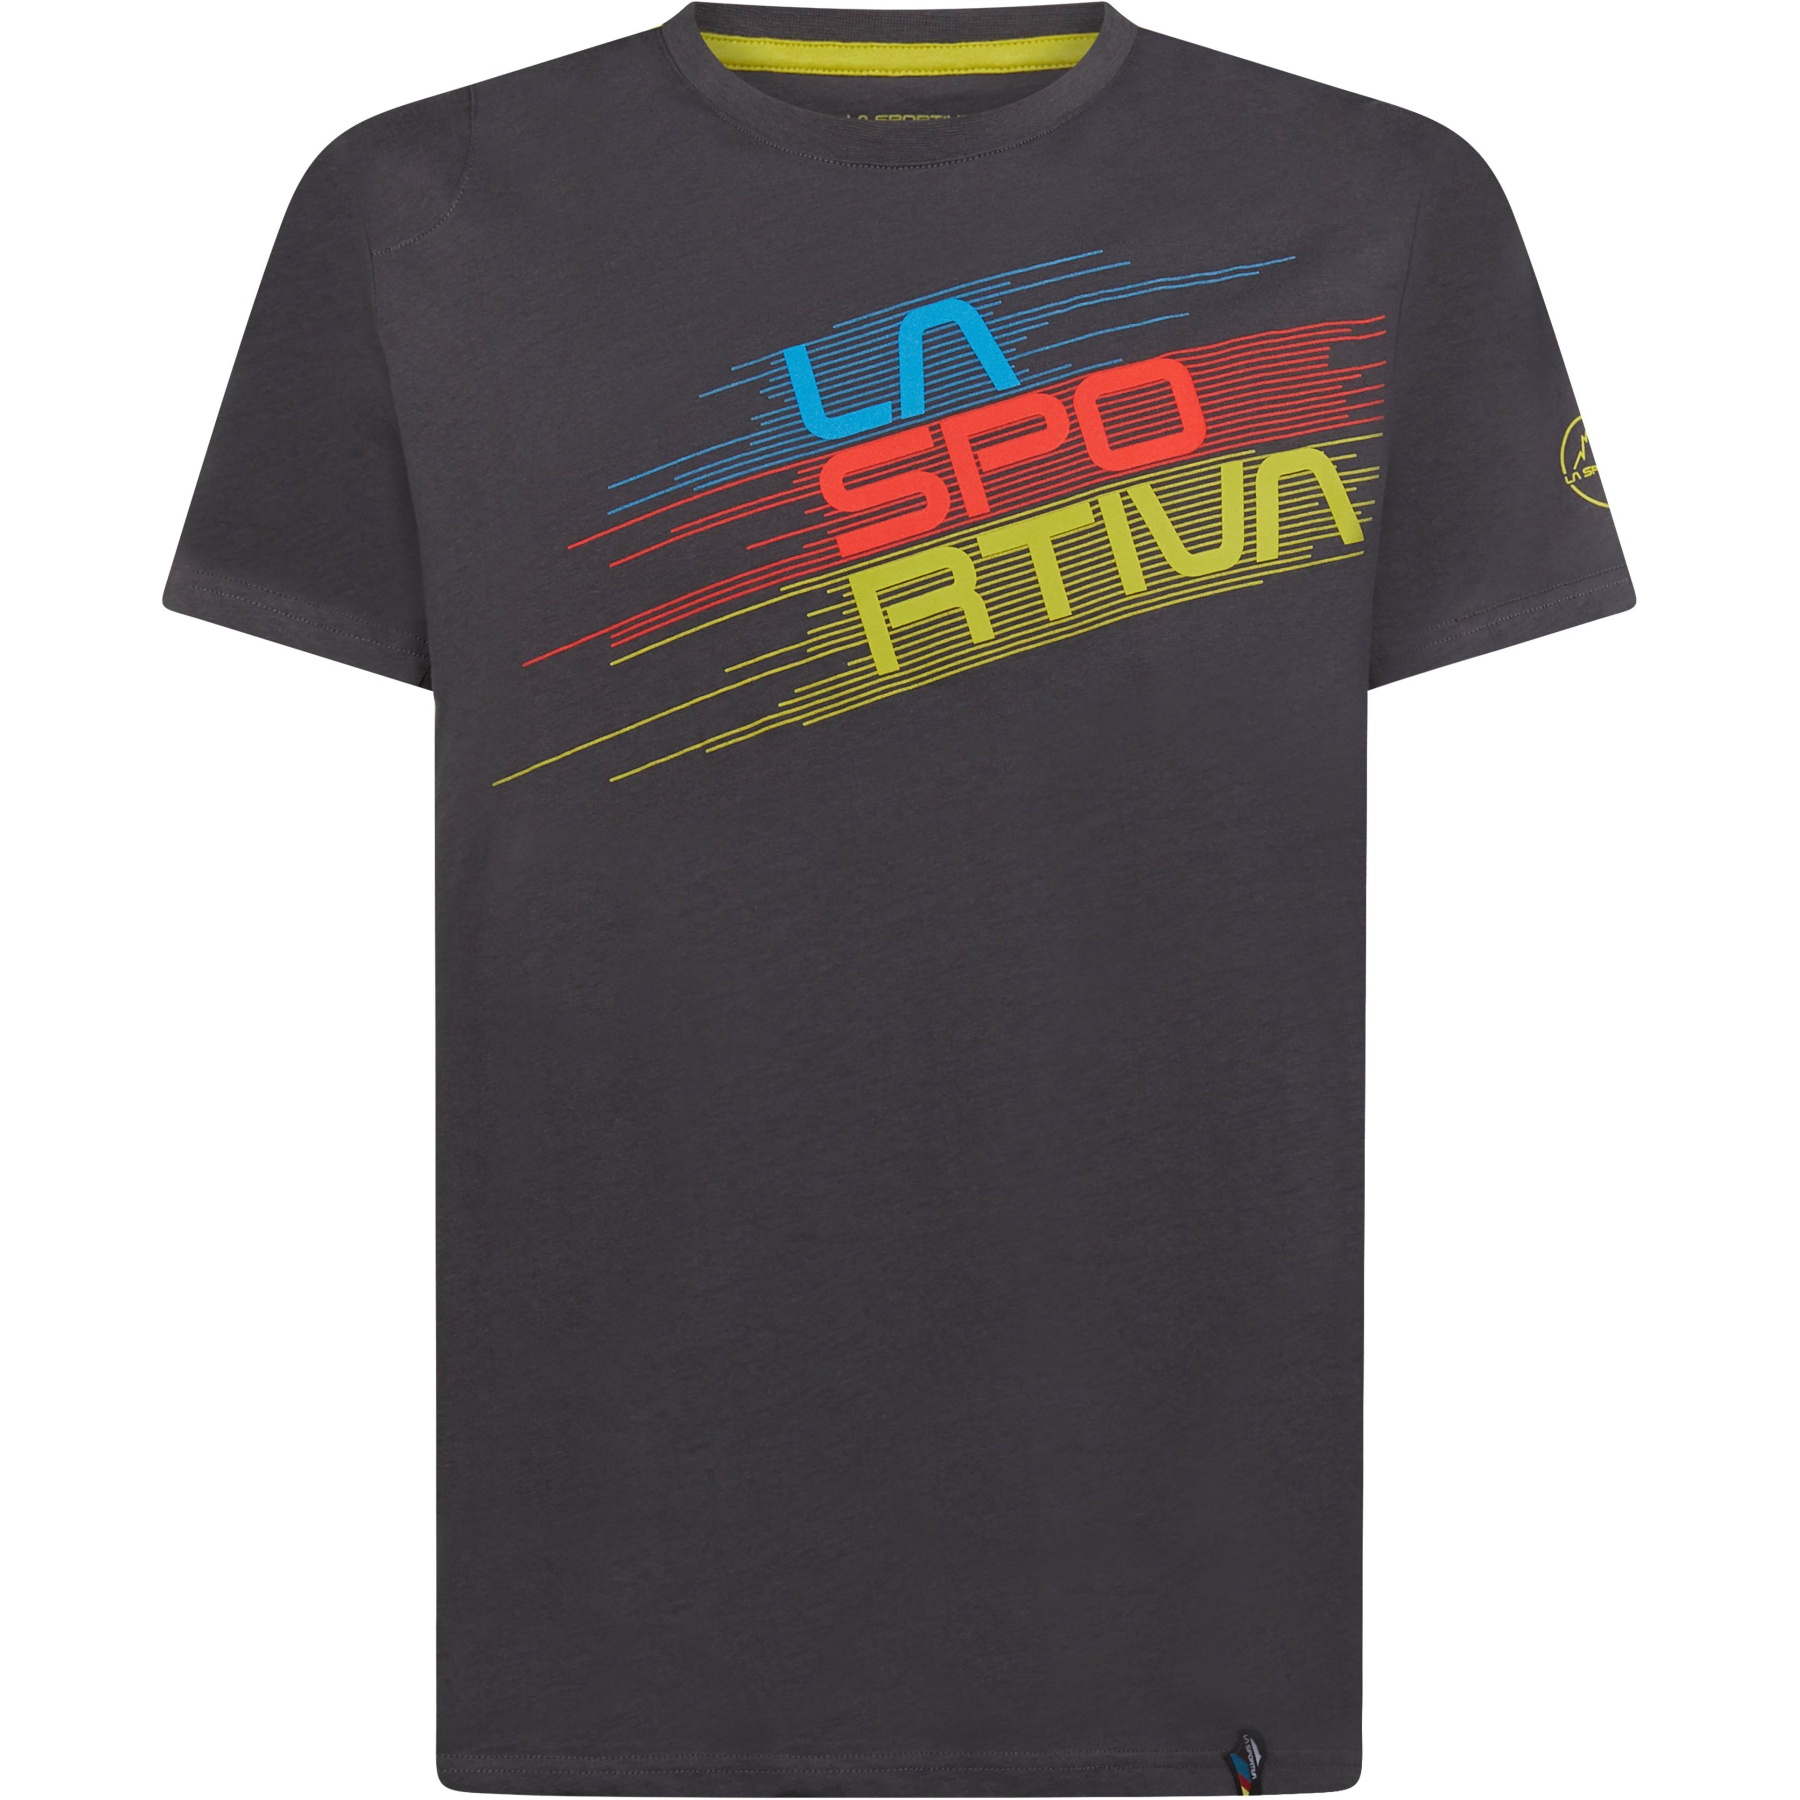 La Sportiva Stripe Evo T-Shirt - Carbon